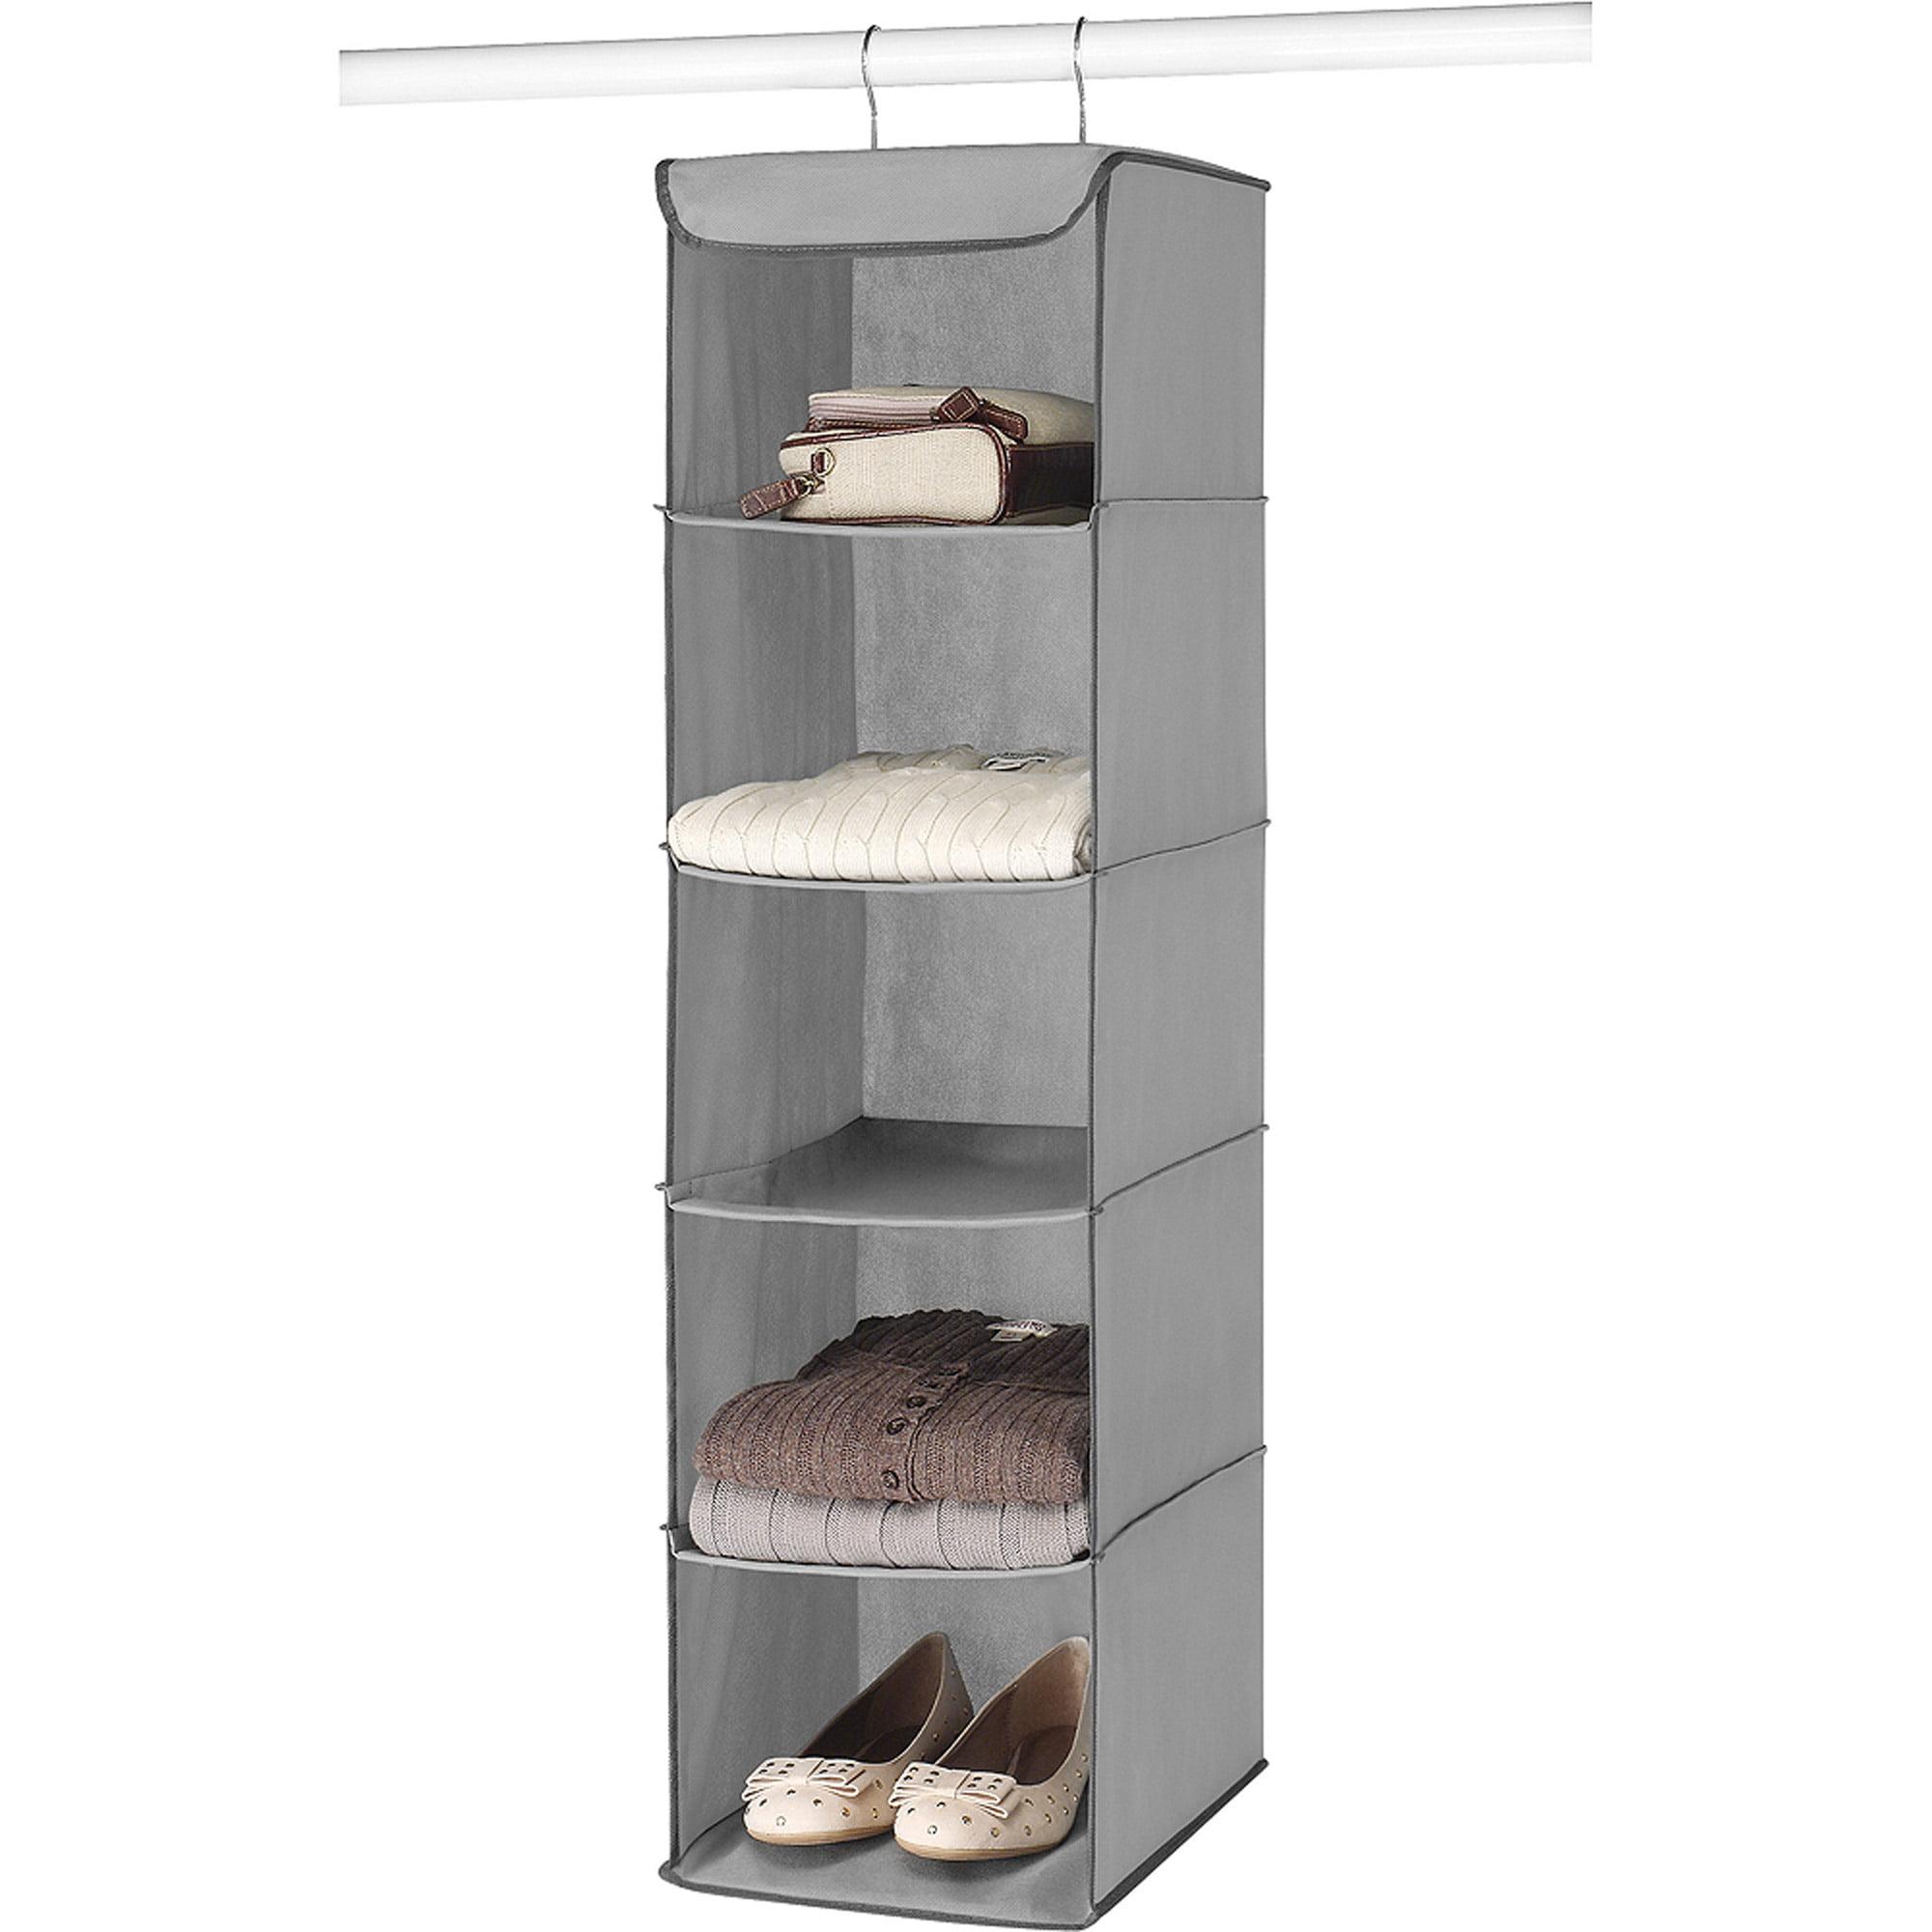 Hanging Shelves whitmor hanging accessory shelves, grey - walmart